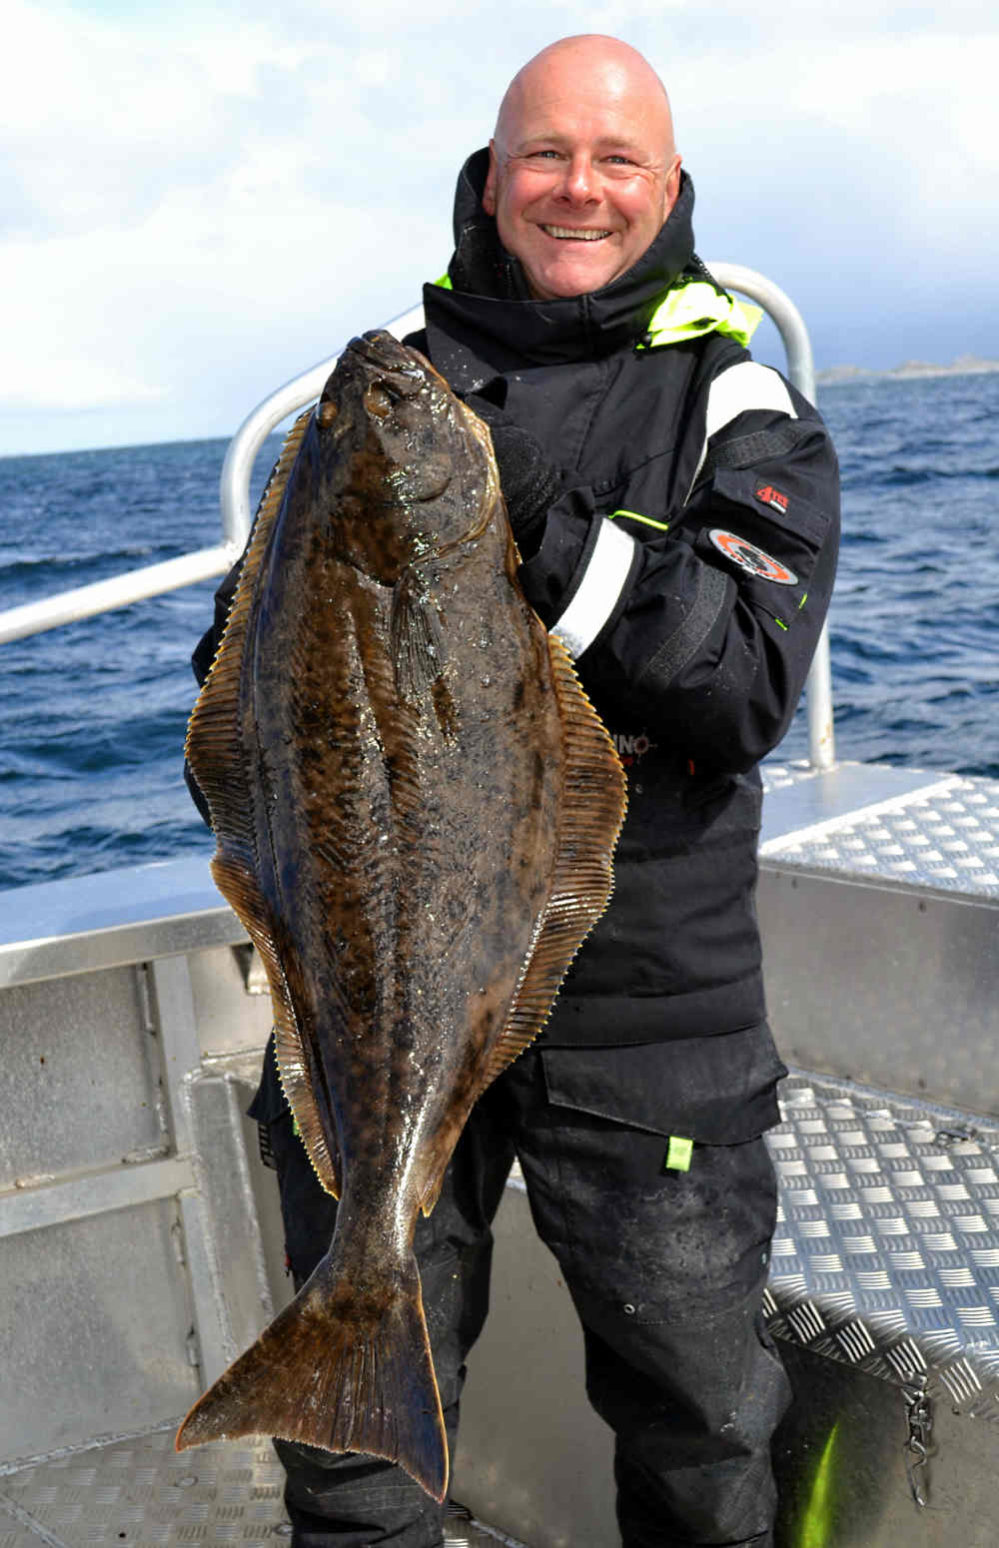 Fishing Guide Thomas Czapla